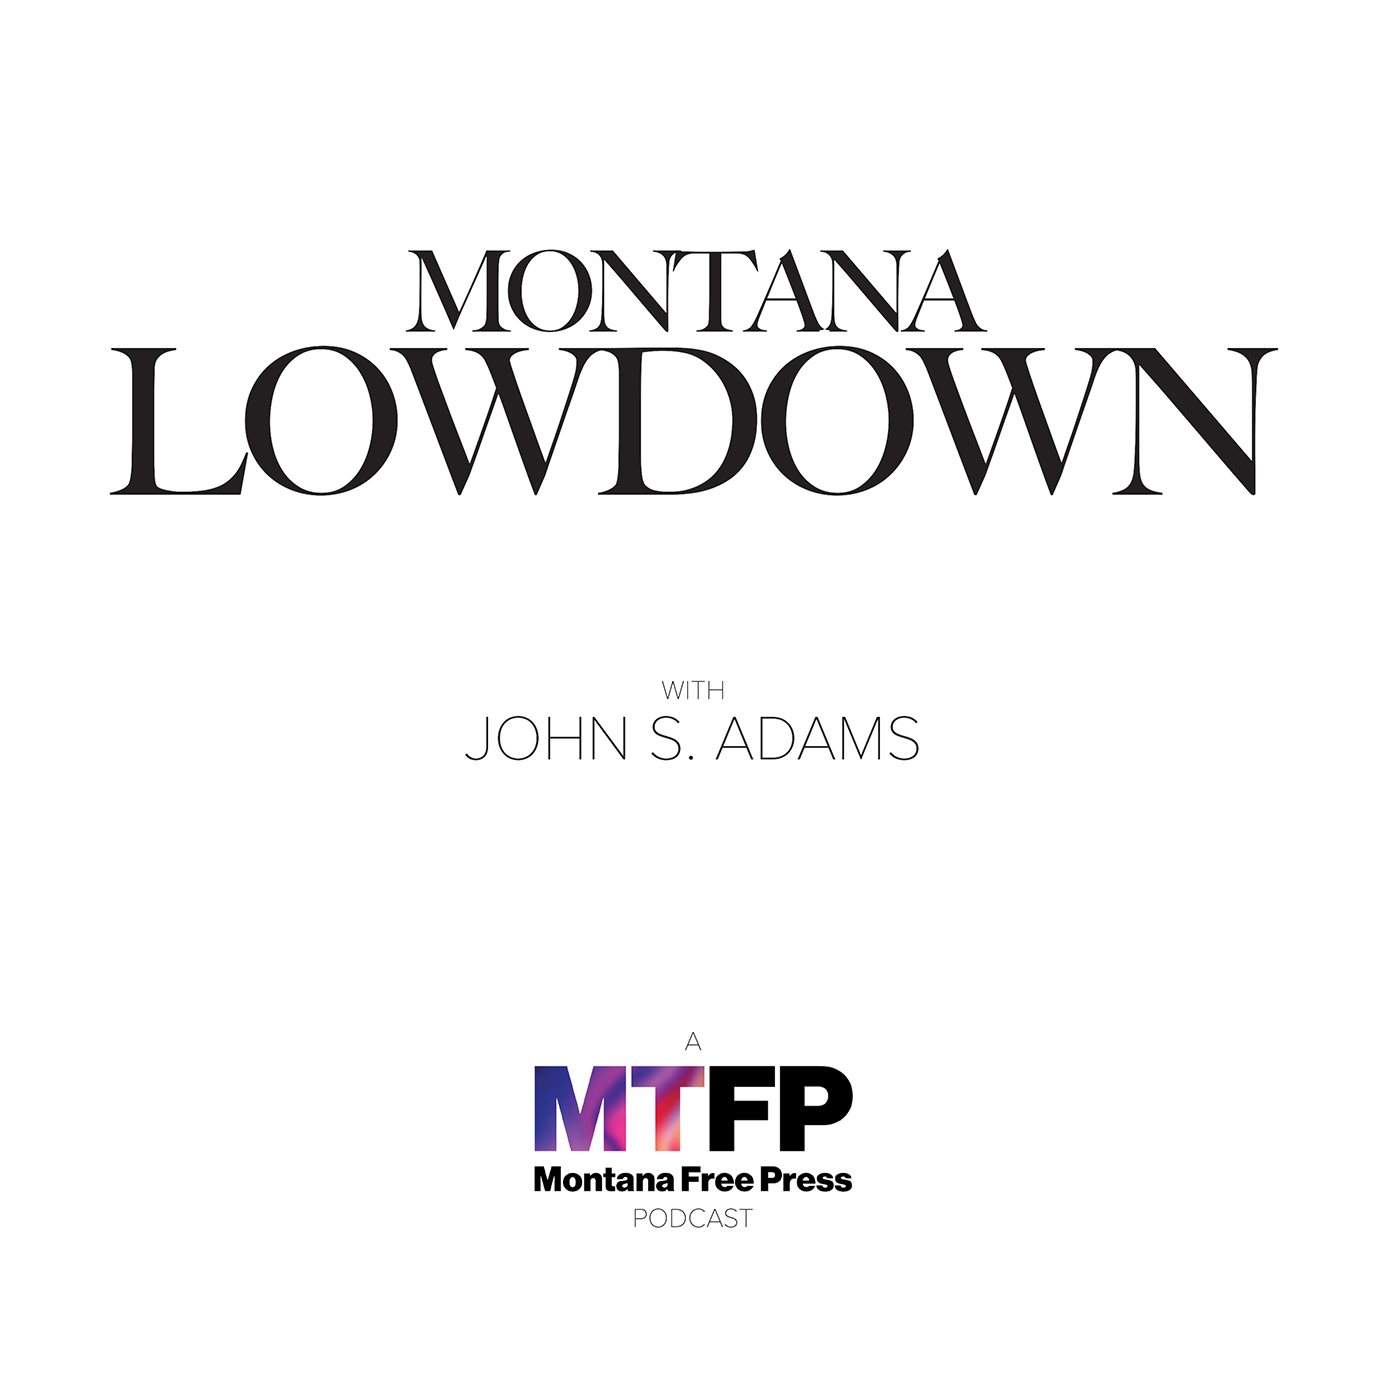 MT Lowdown Podcast – Episode 29: Reporter Amanda Eggert   Montana